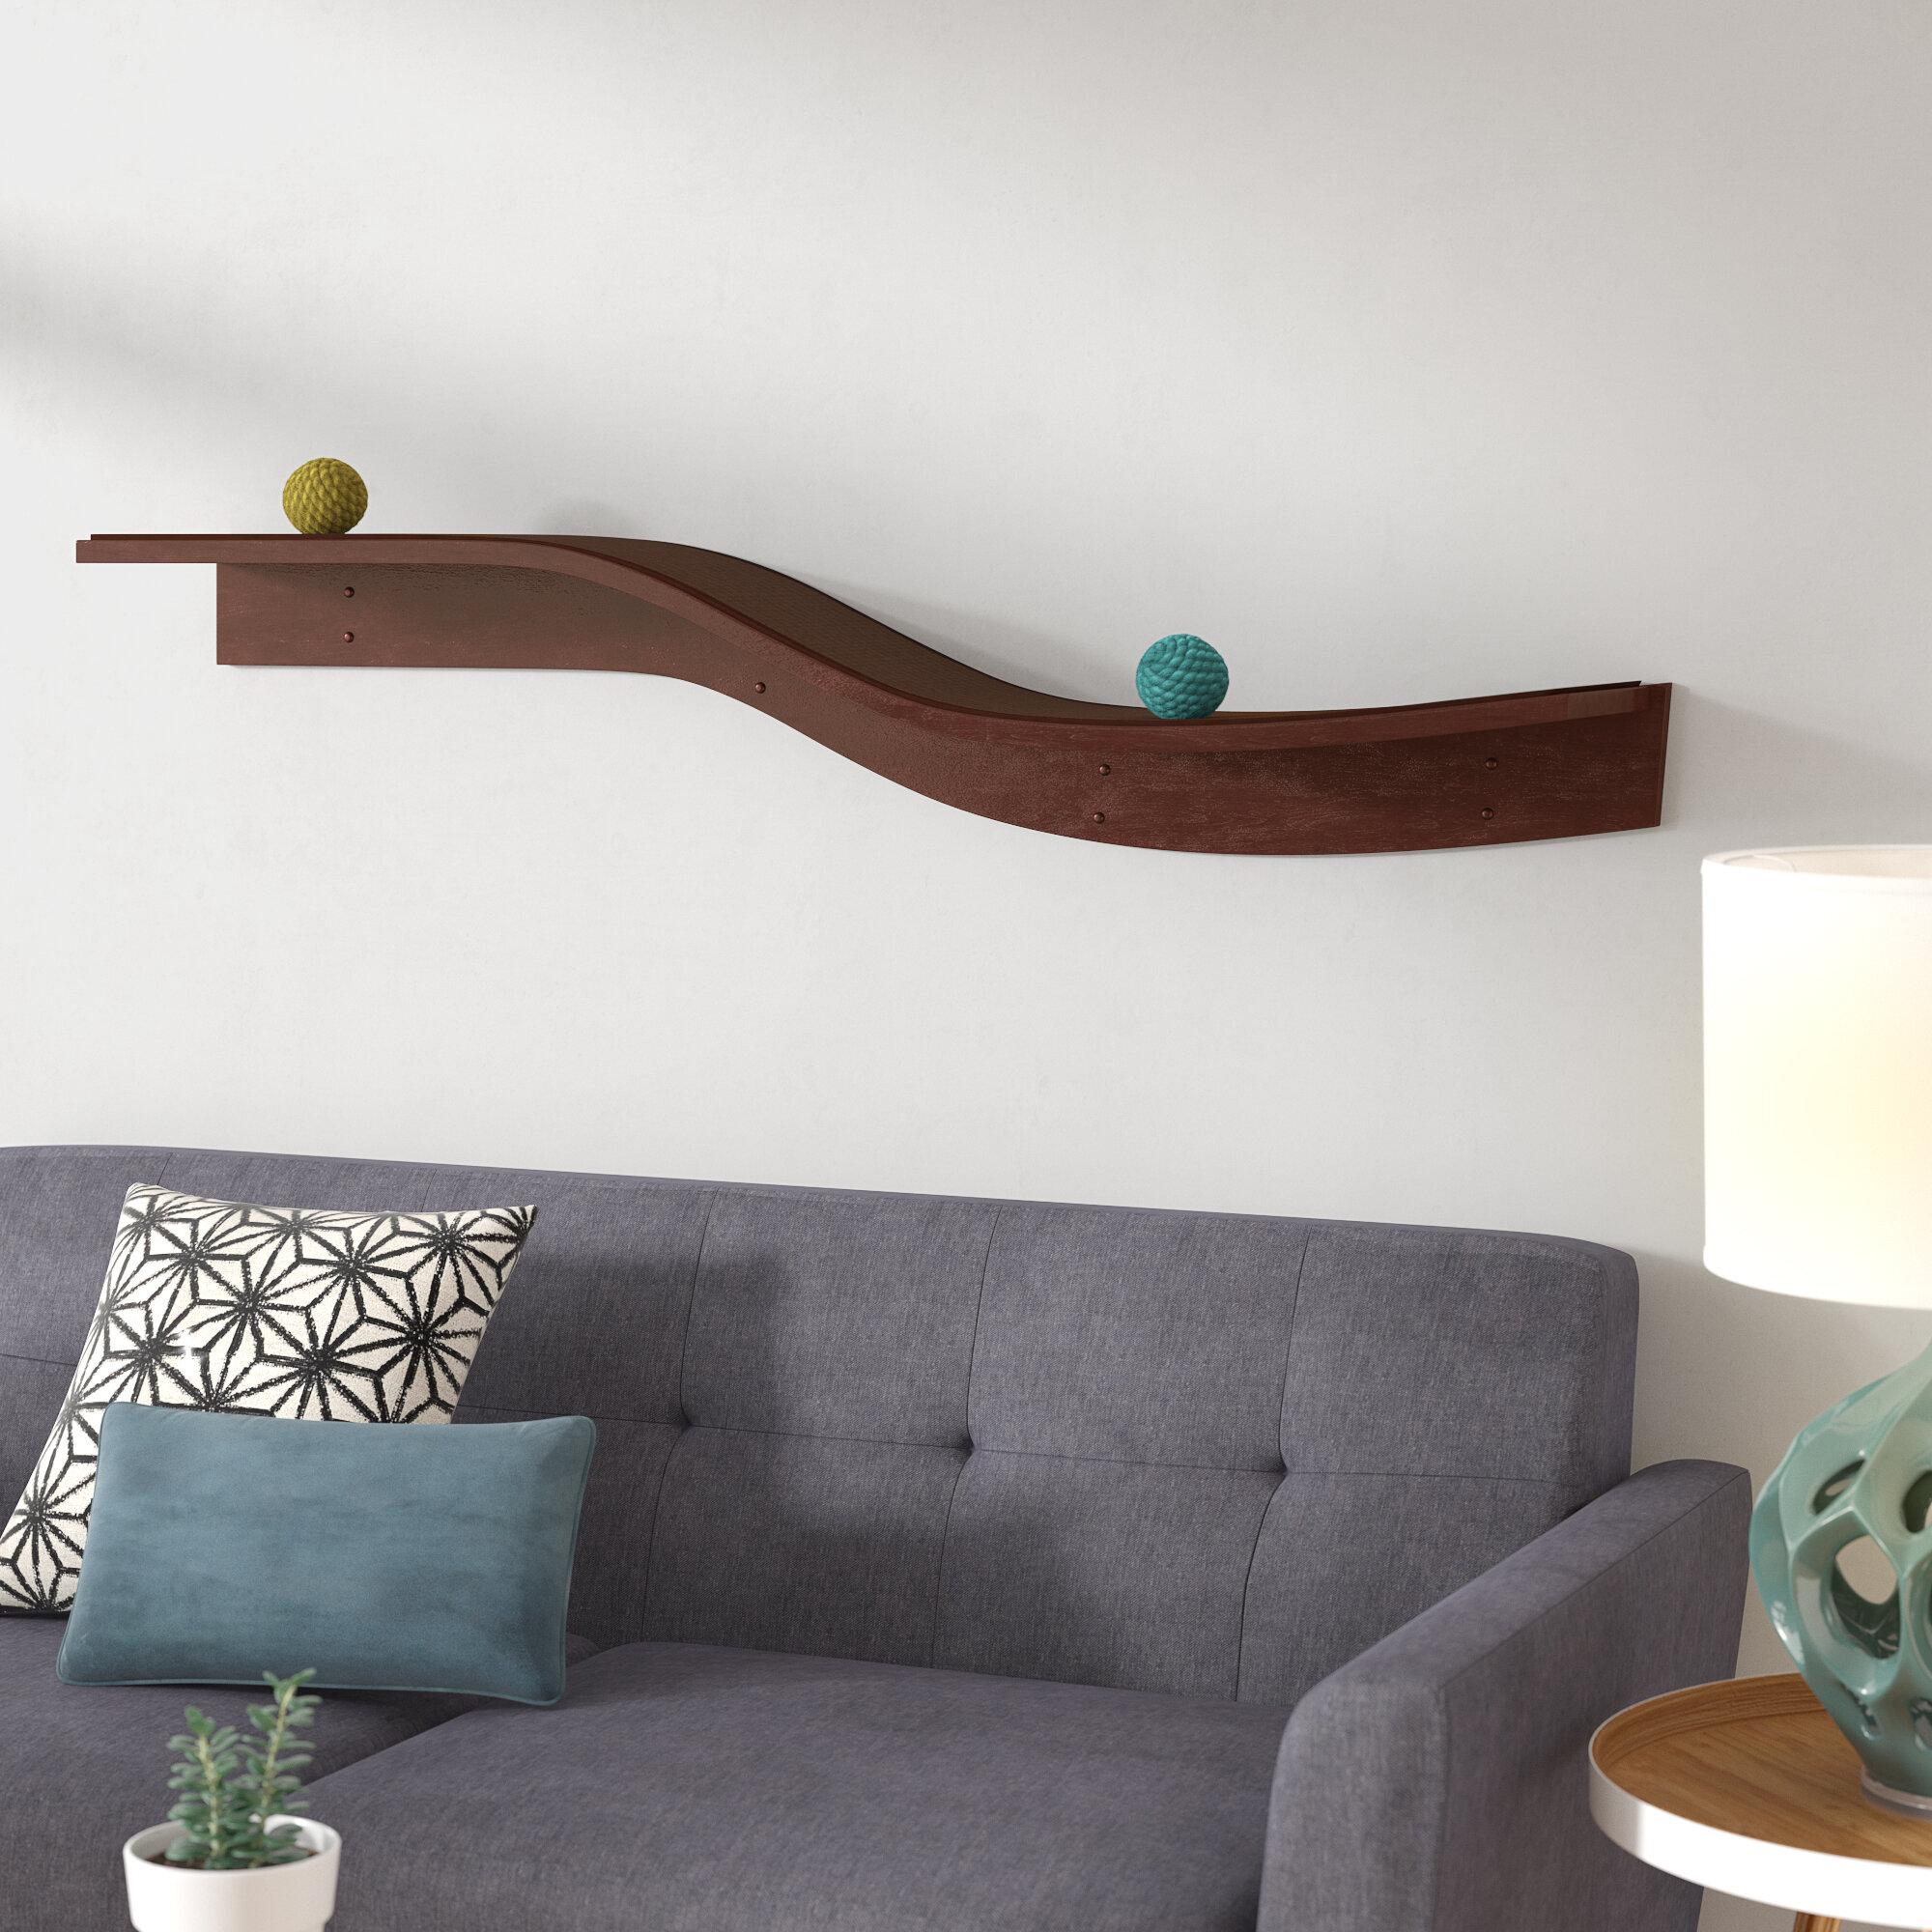 Arbre A Chat Mural Design archie & oscar cleopatra branch cat perch & reviews | wayfair.ca